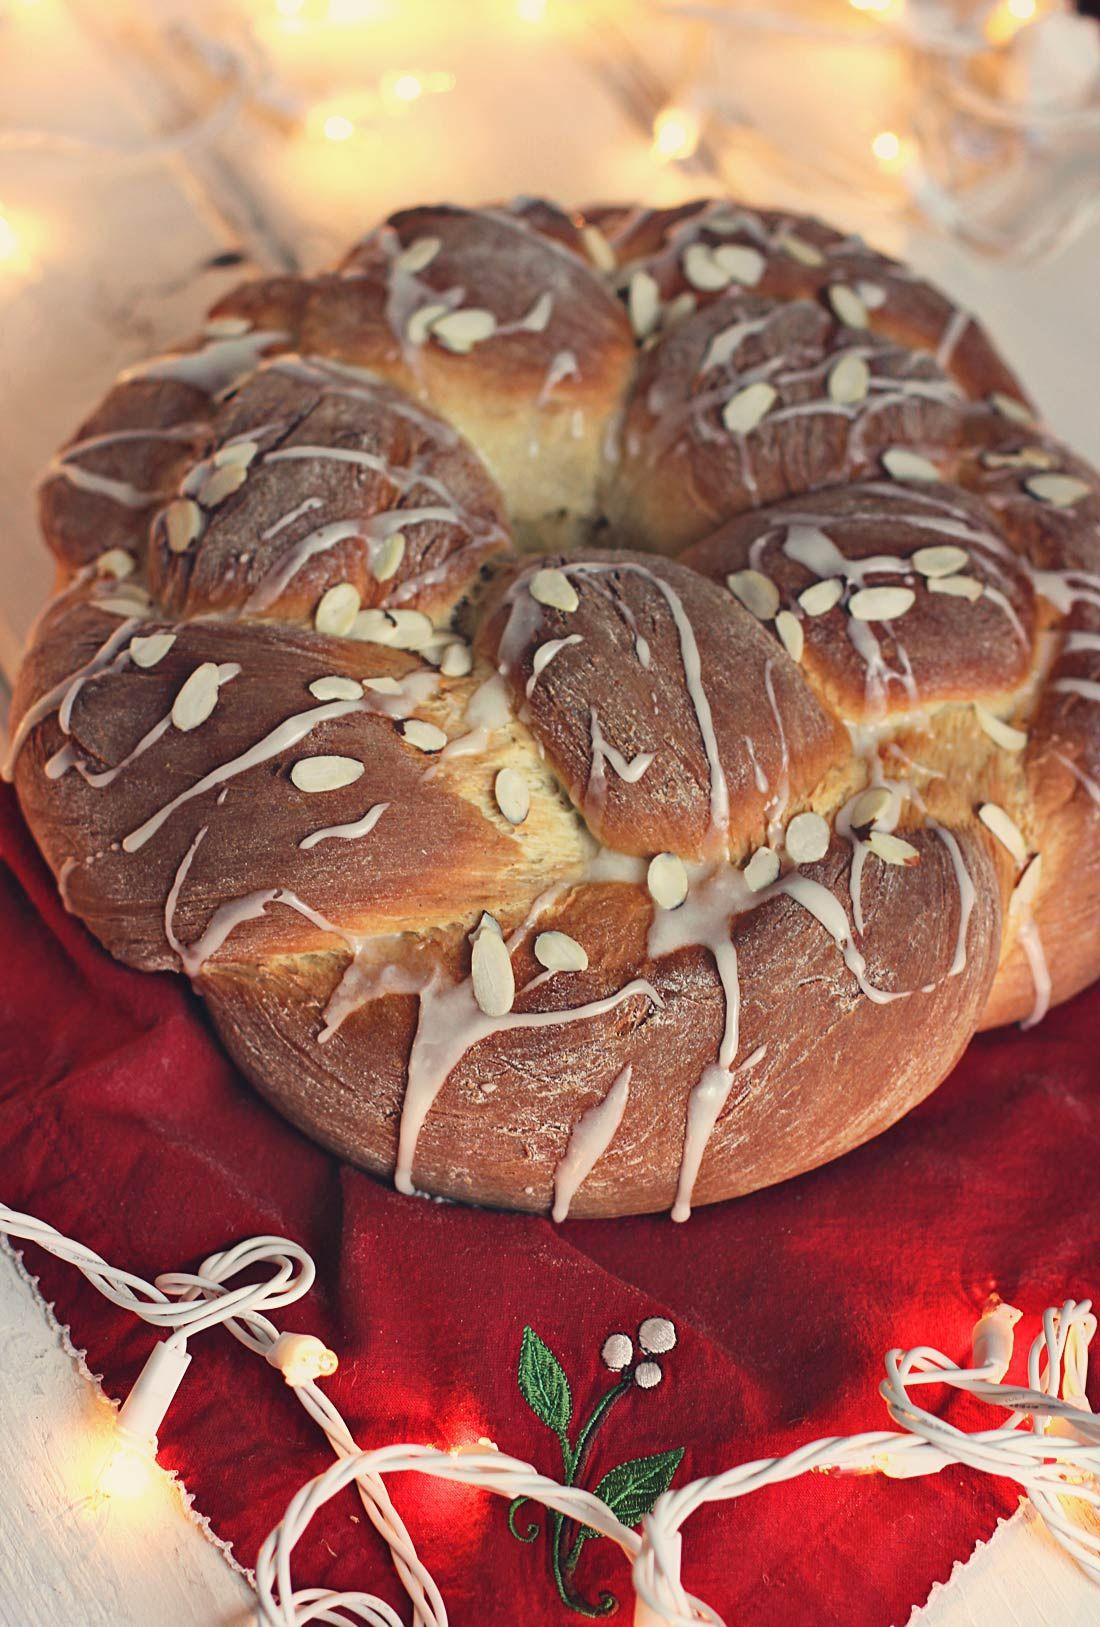 Swedish Christmas Bread.Swedish Christmas Bread Braid Kardemumma Krans